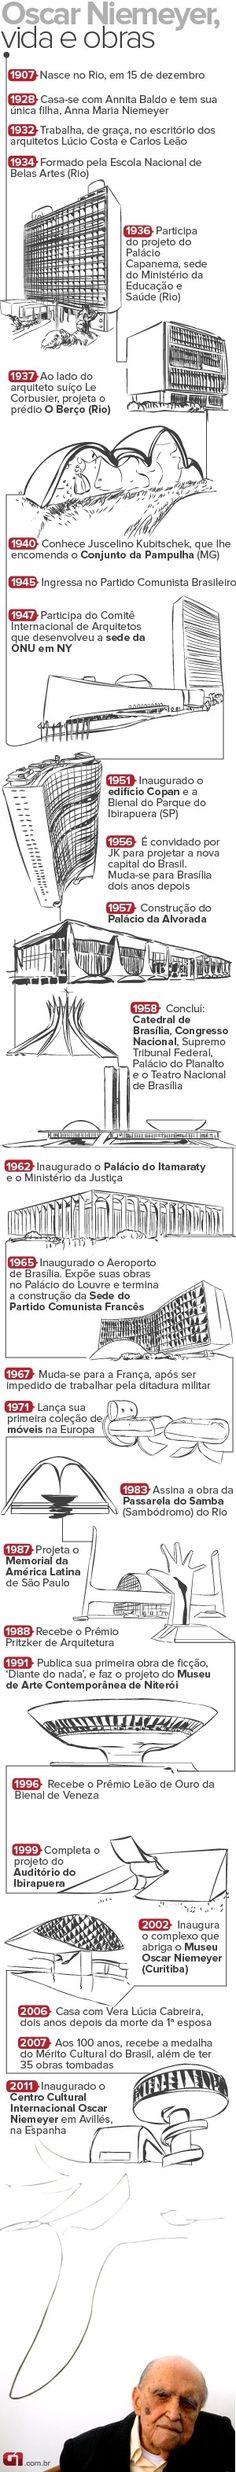 Adeus Niemeyer